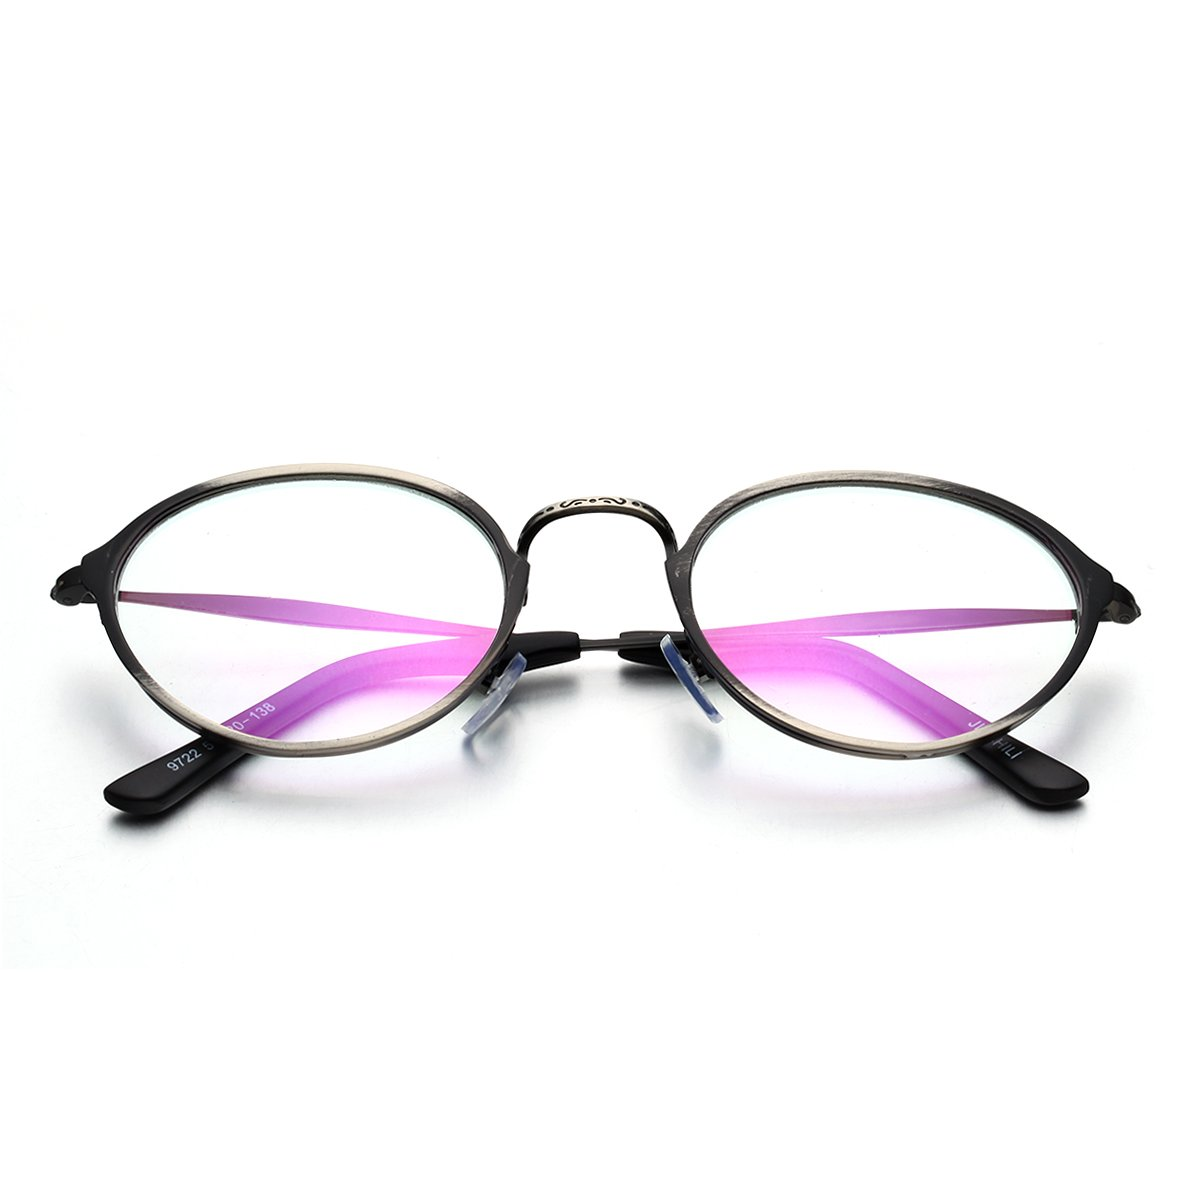 56adb23abdc Amazon.com  PenSee Optical Vintage Designed Metal Eye Glasses Round Circle  Oval Eyewear Frames (Brushed bronze